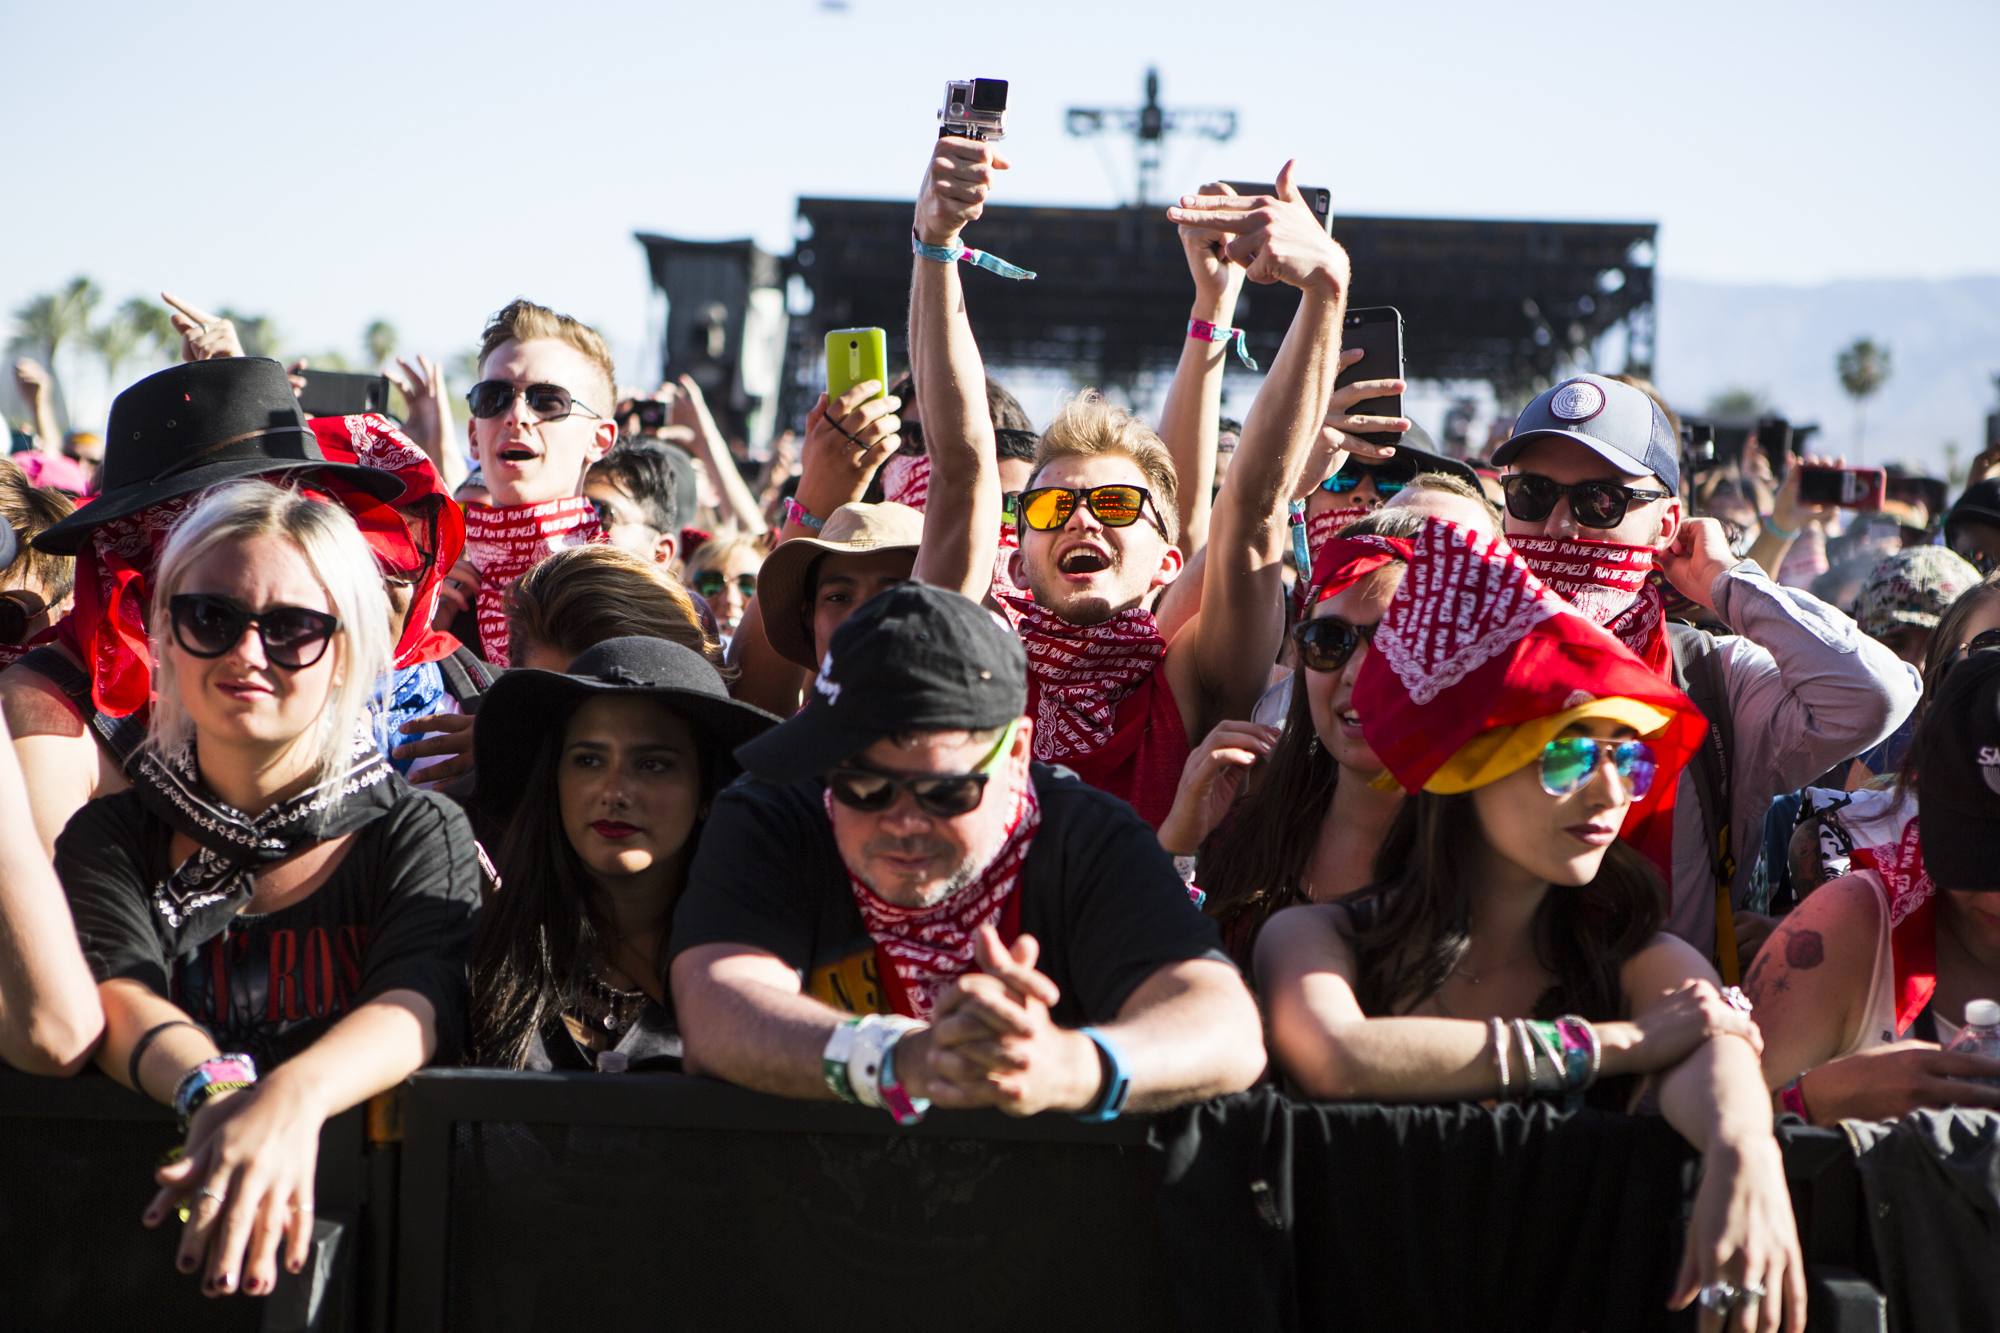 Coachella 2016, photo by Philip Cosores